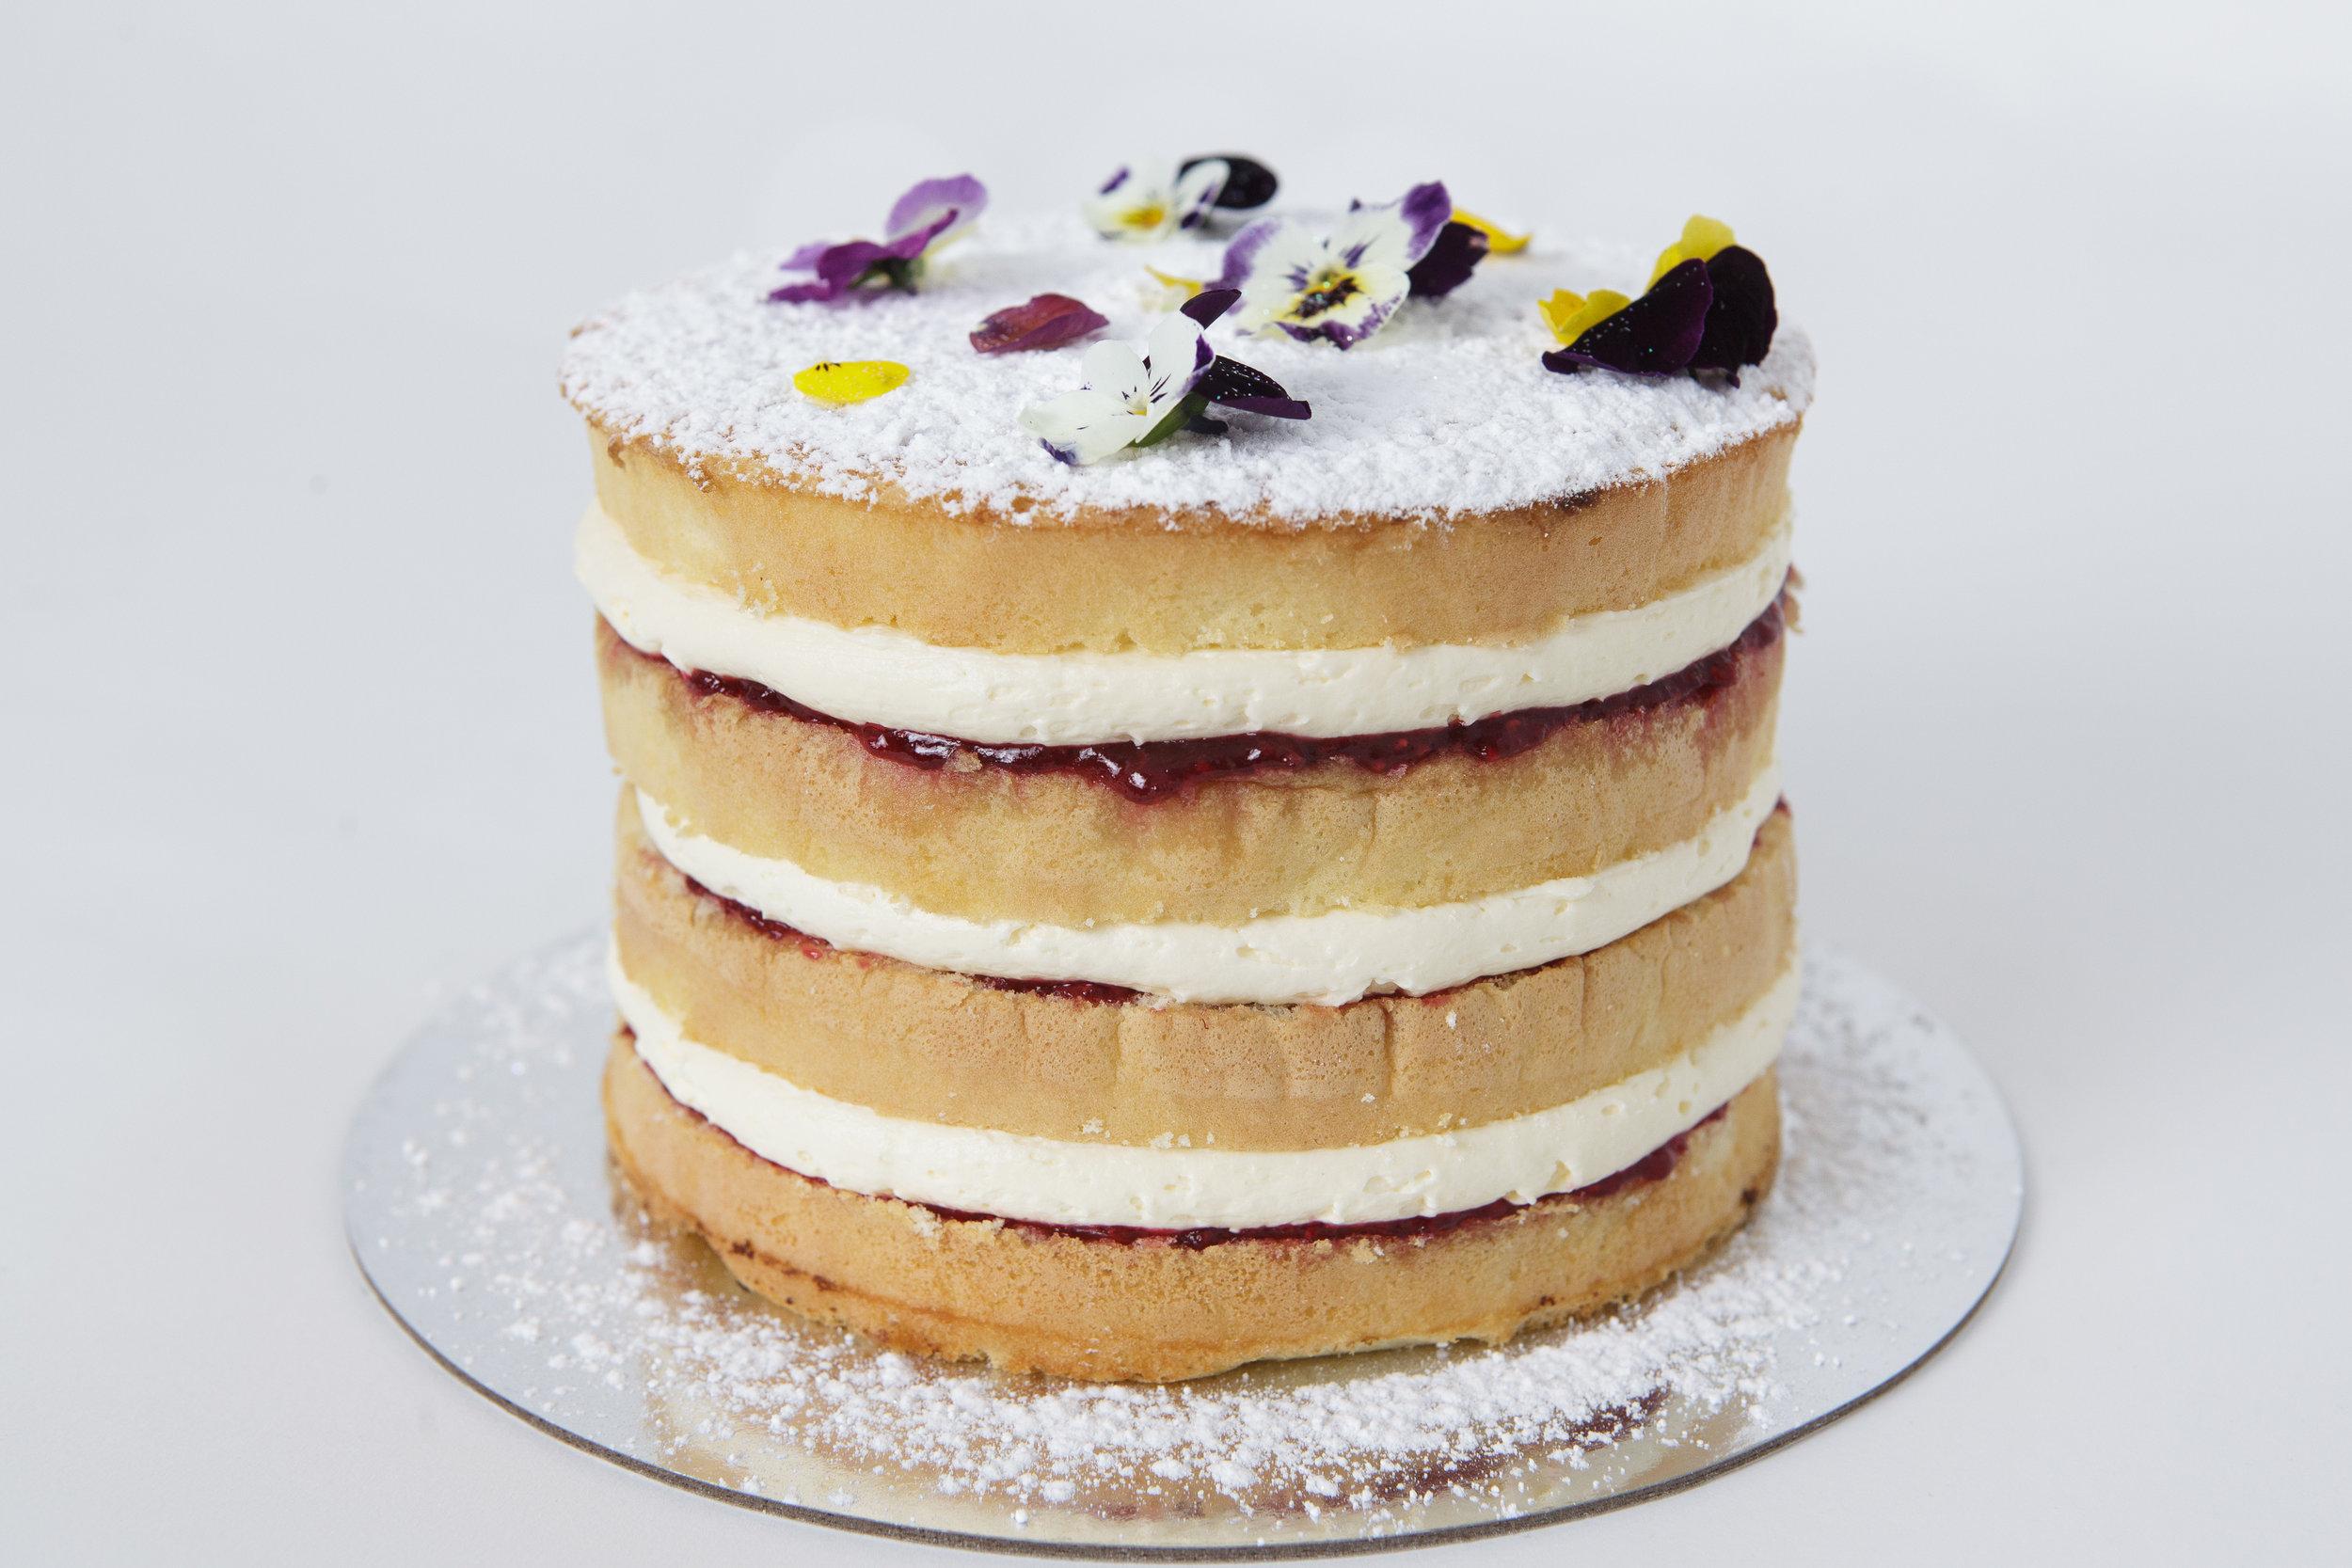 vanillapod_webstore_cakes-17.jpg